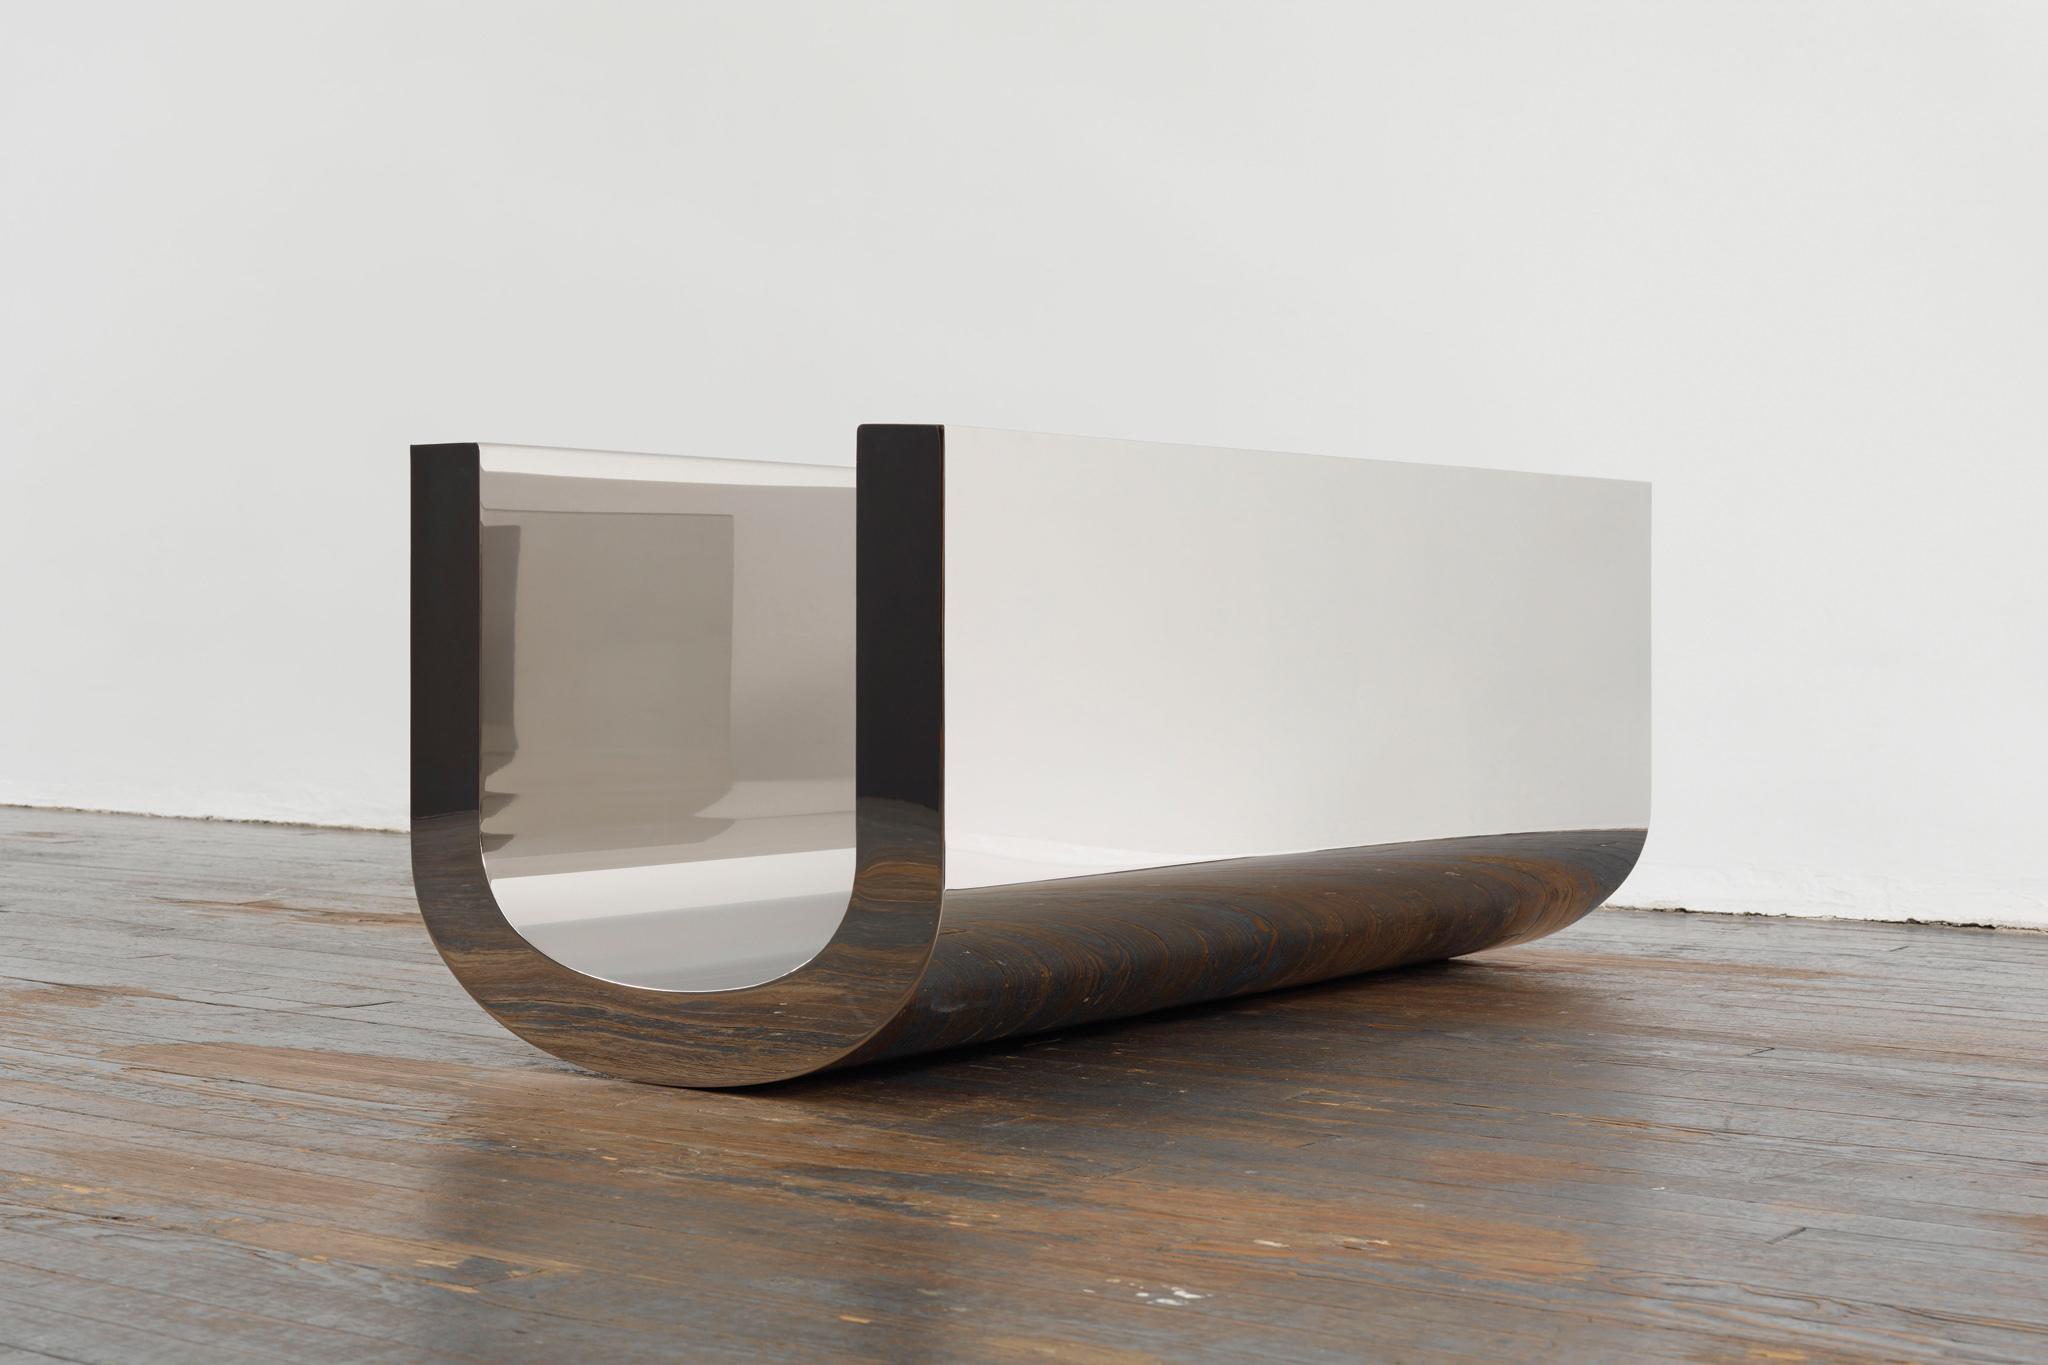 Wade Guyton, , U Sculpture (v. 6), 2007